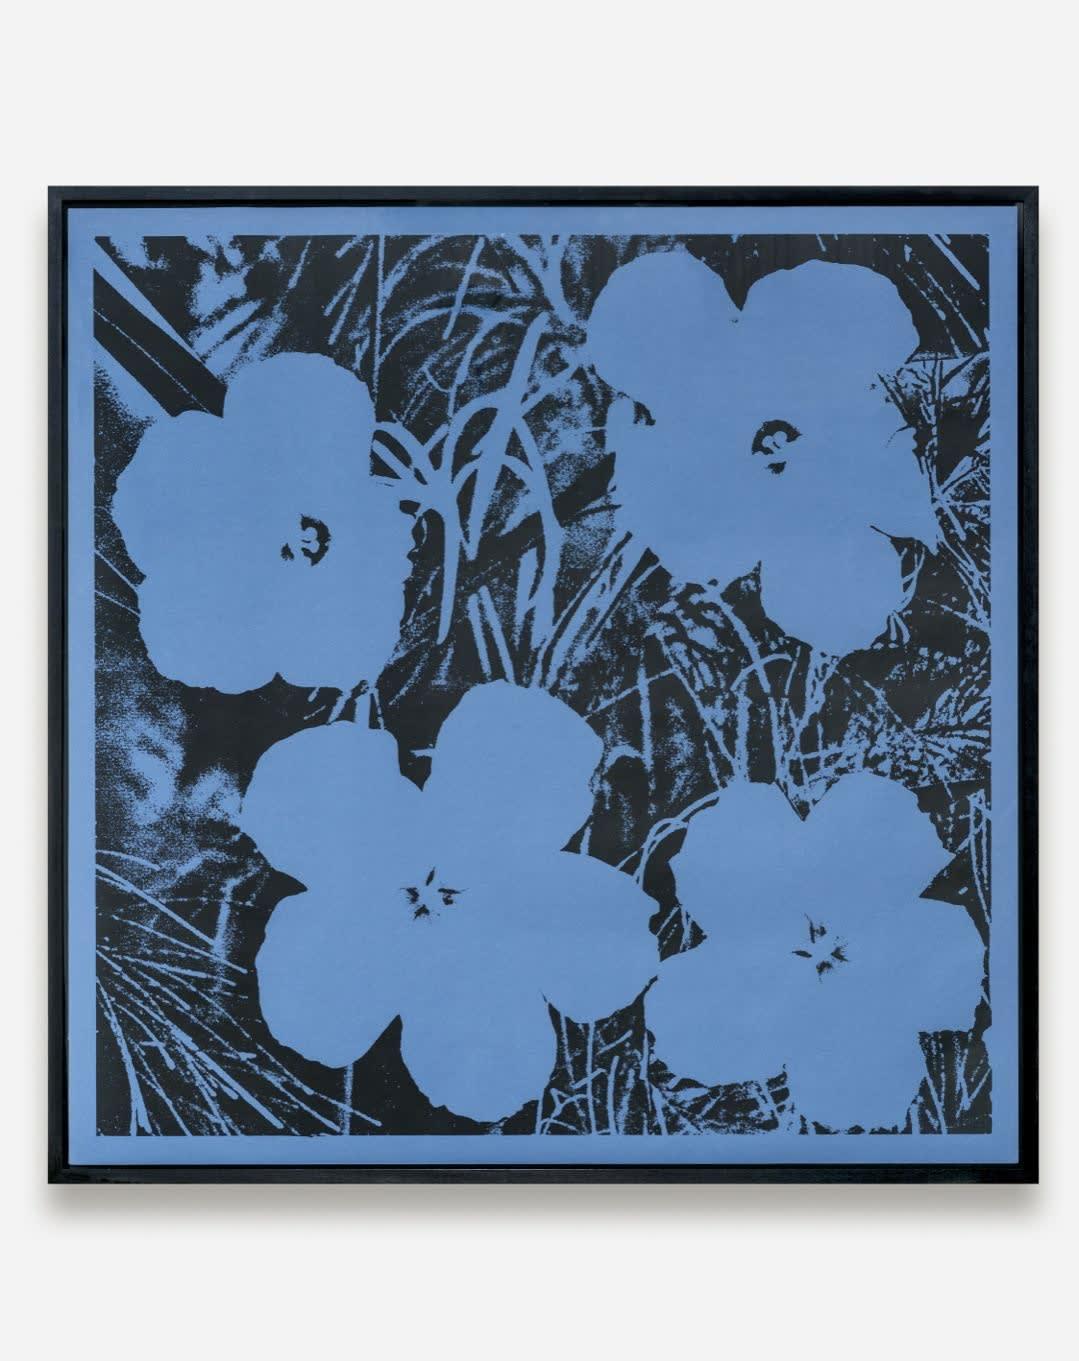 STURTEVANT Elaine Warhol Flowers (black ink blue paper), 1990